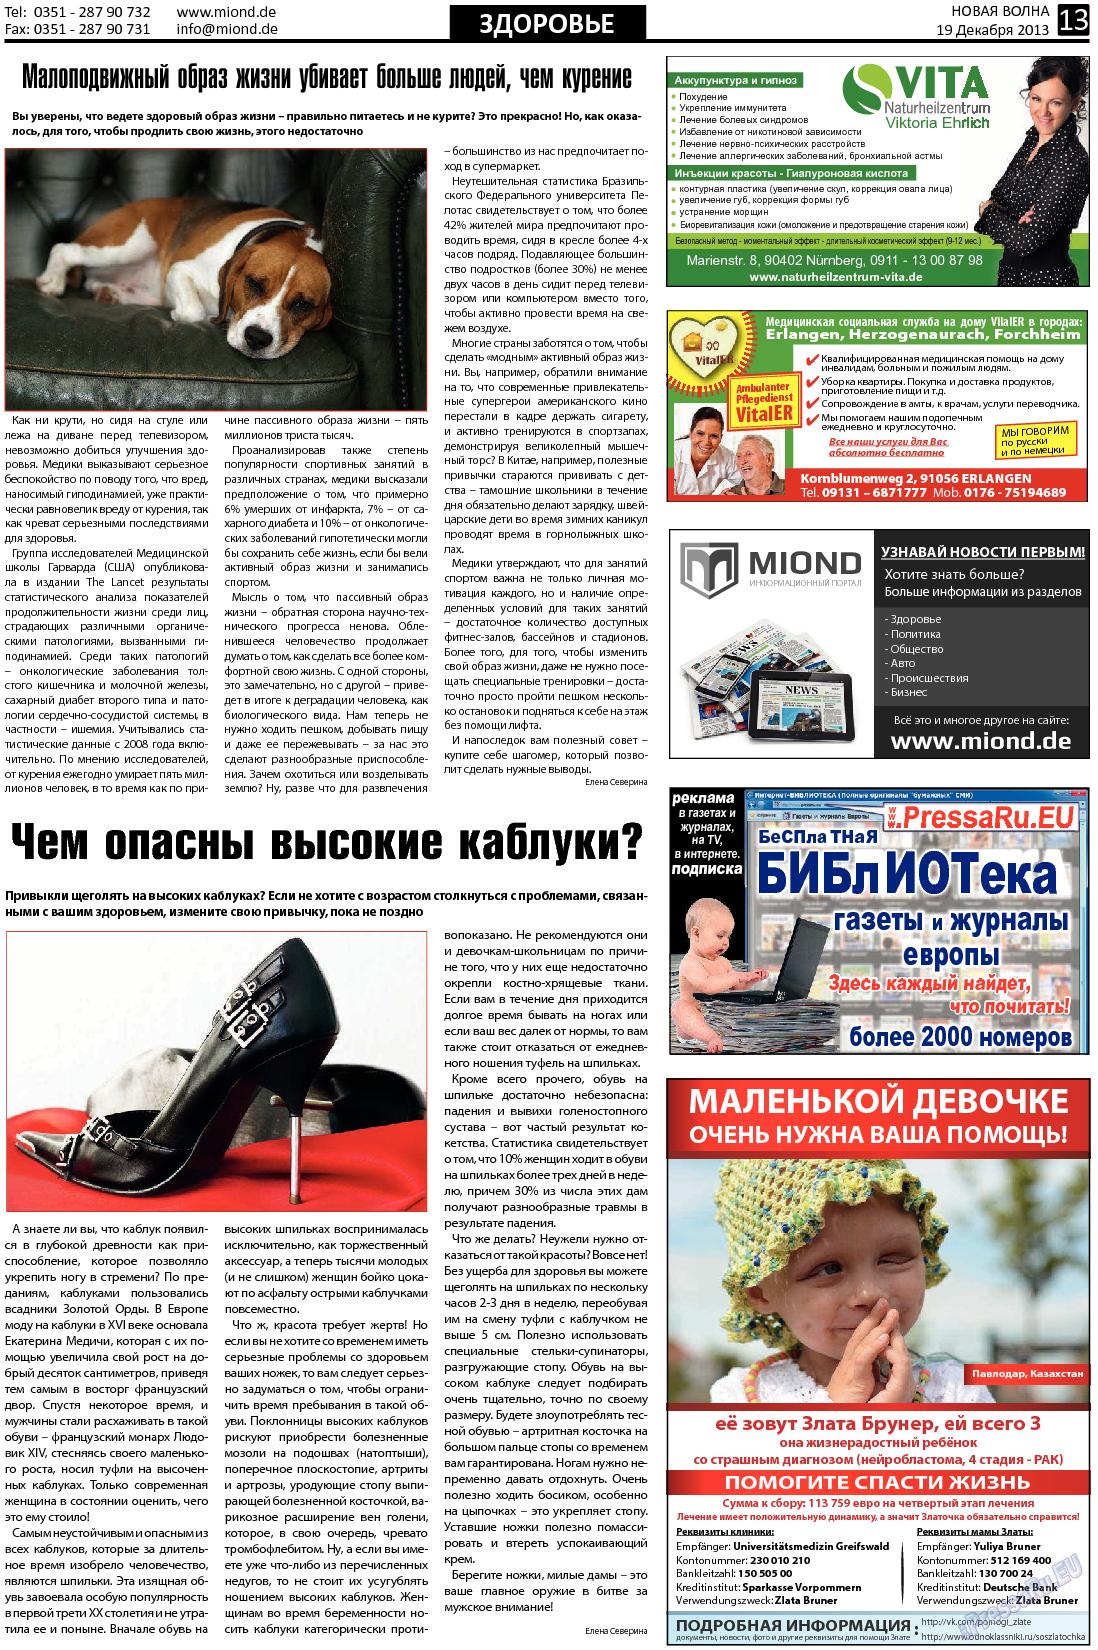 Новая Wолна (газета). 2013 год, номер 51, стр. 13